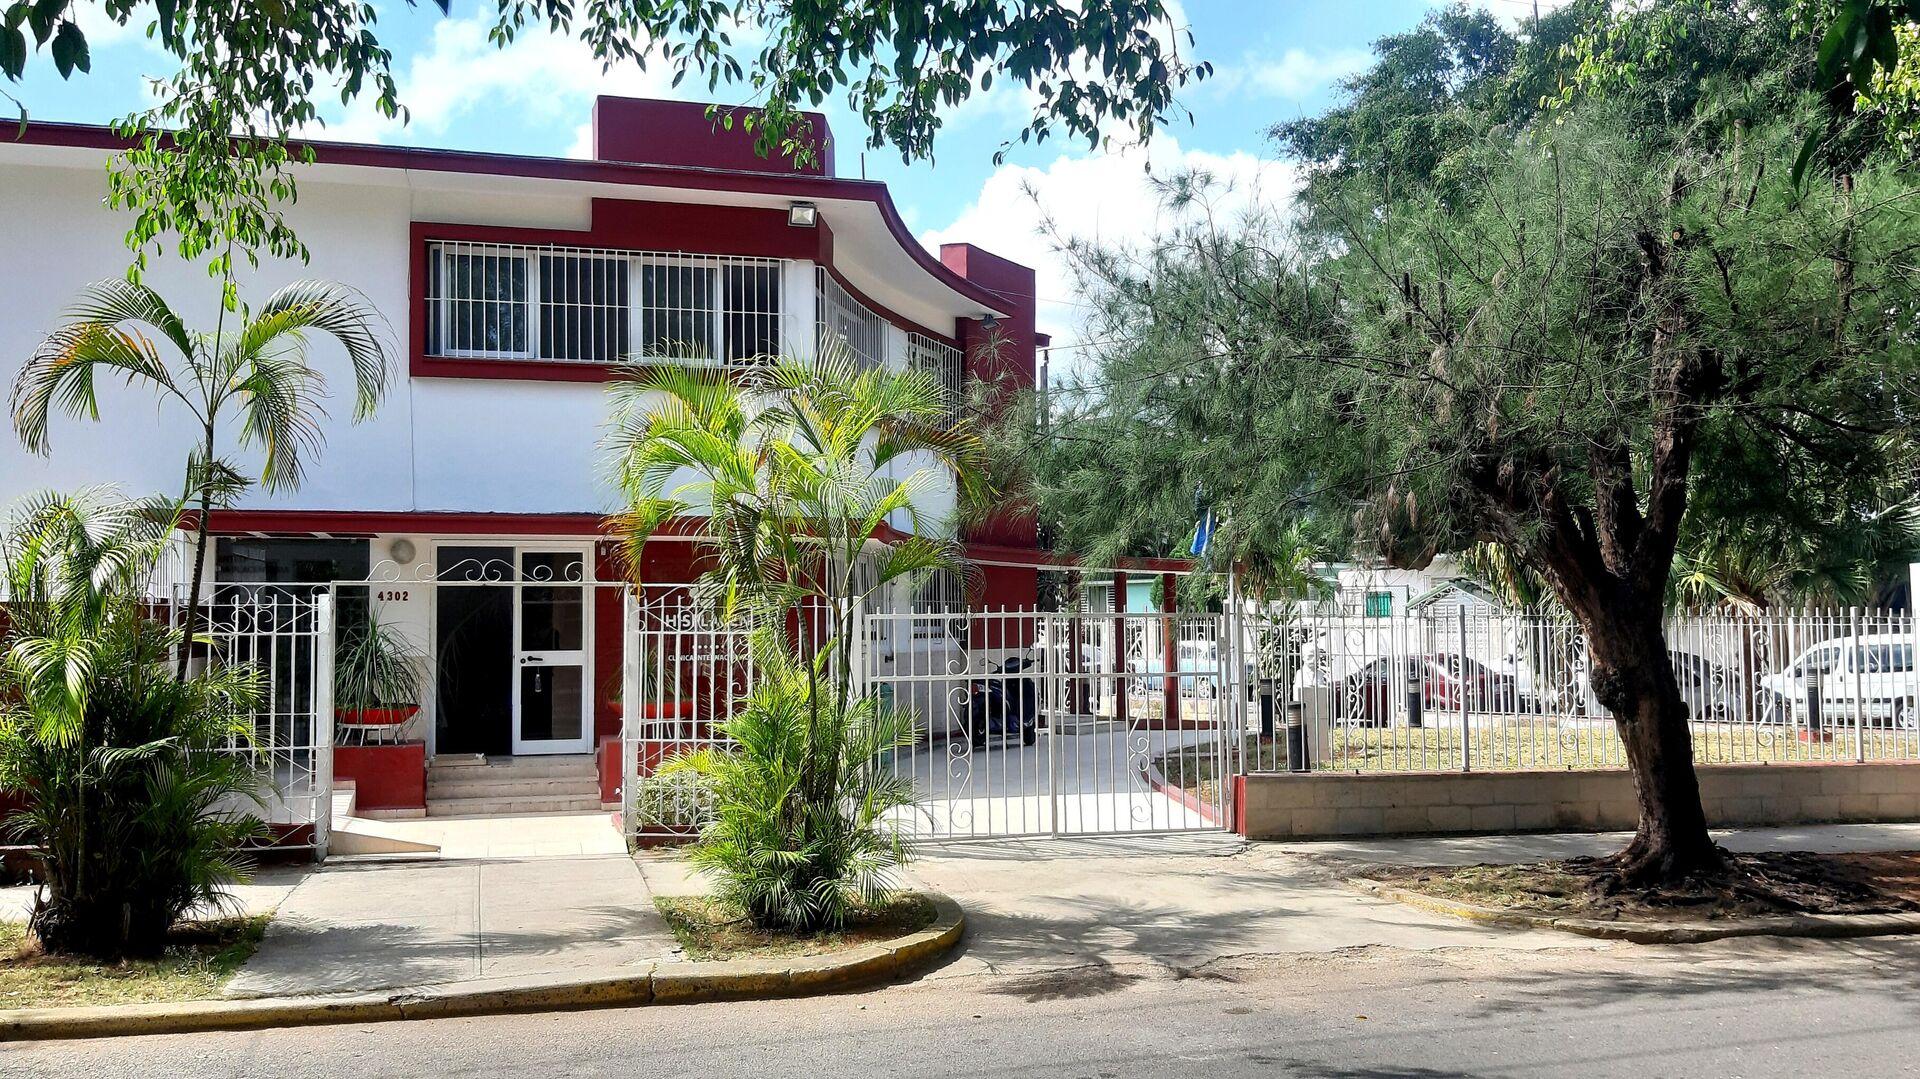 Centro Histoterapia Placentaria de Cuba - Sputnik Mundo, 1920, 27.04.2021